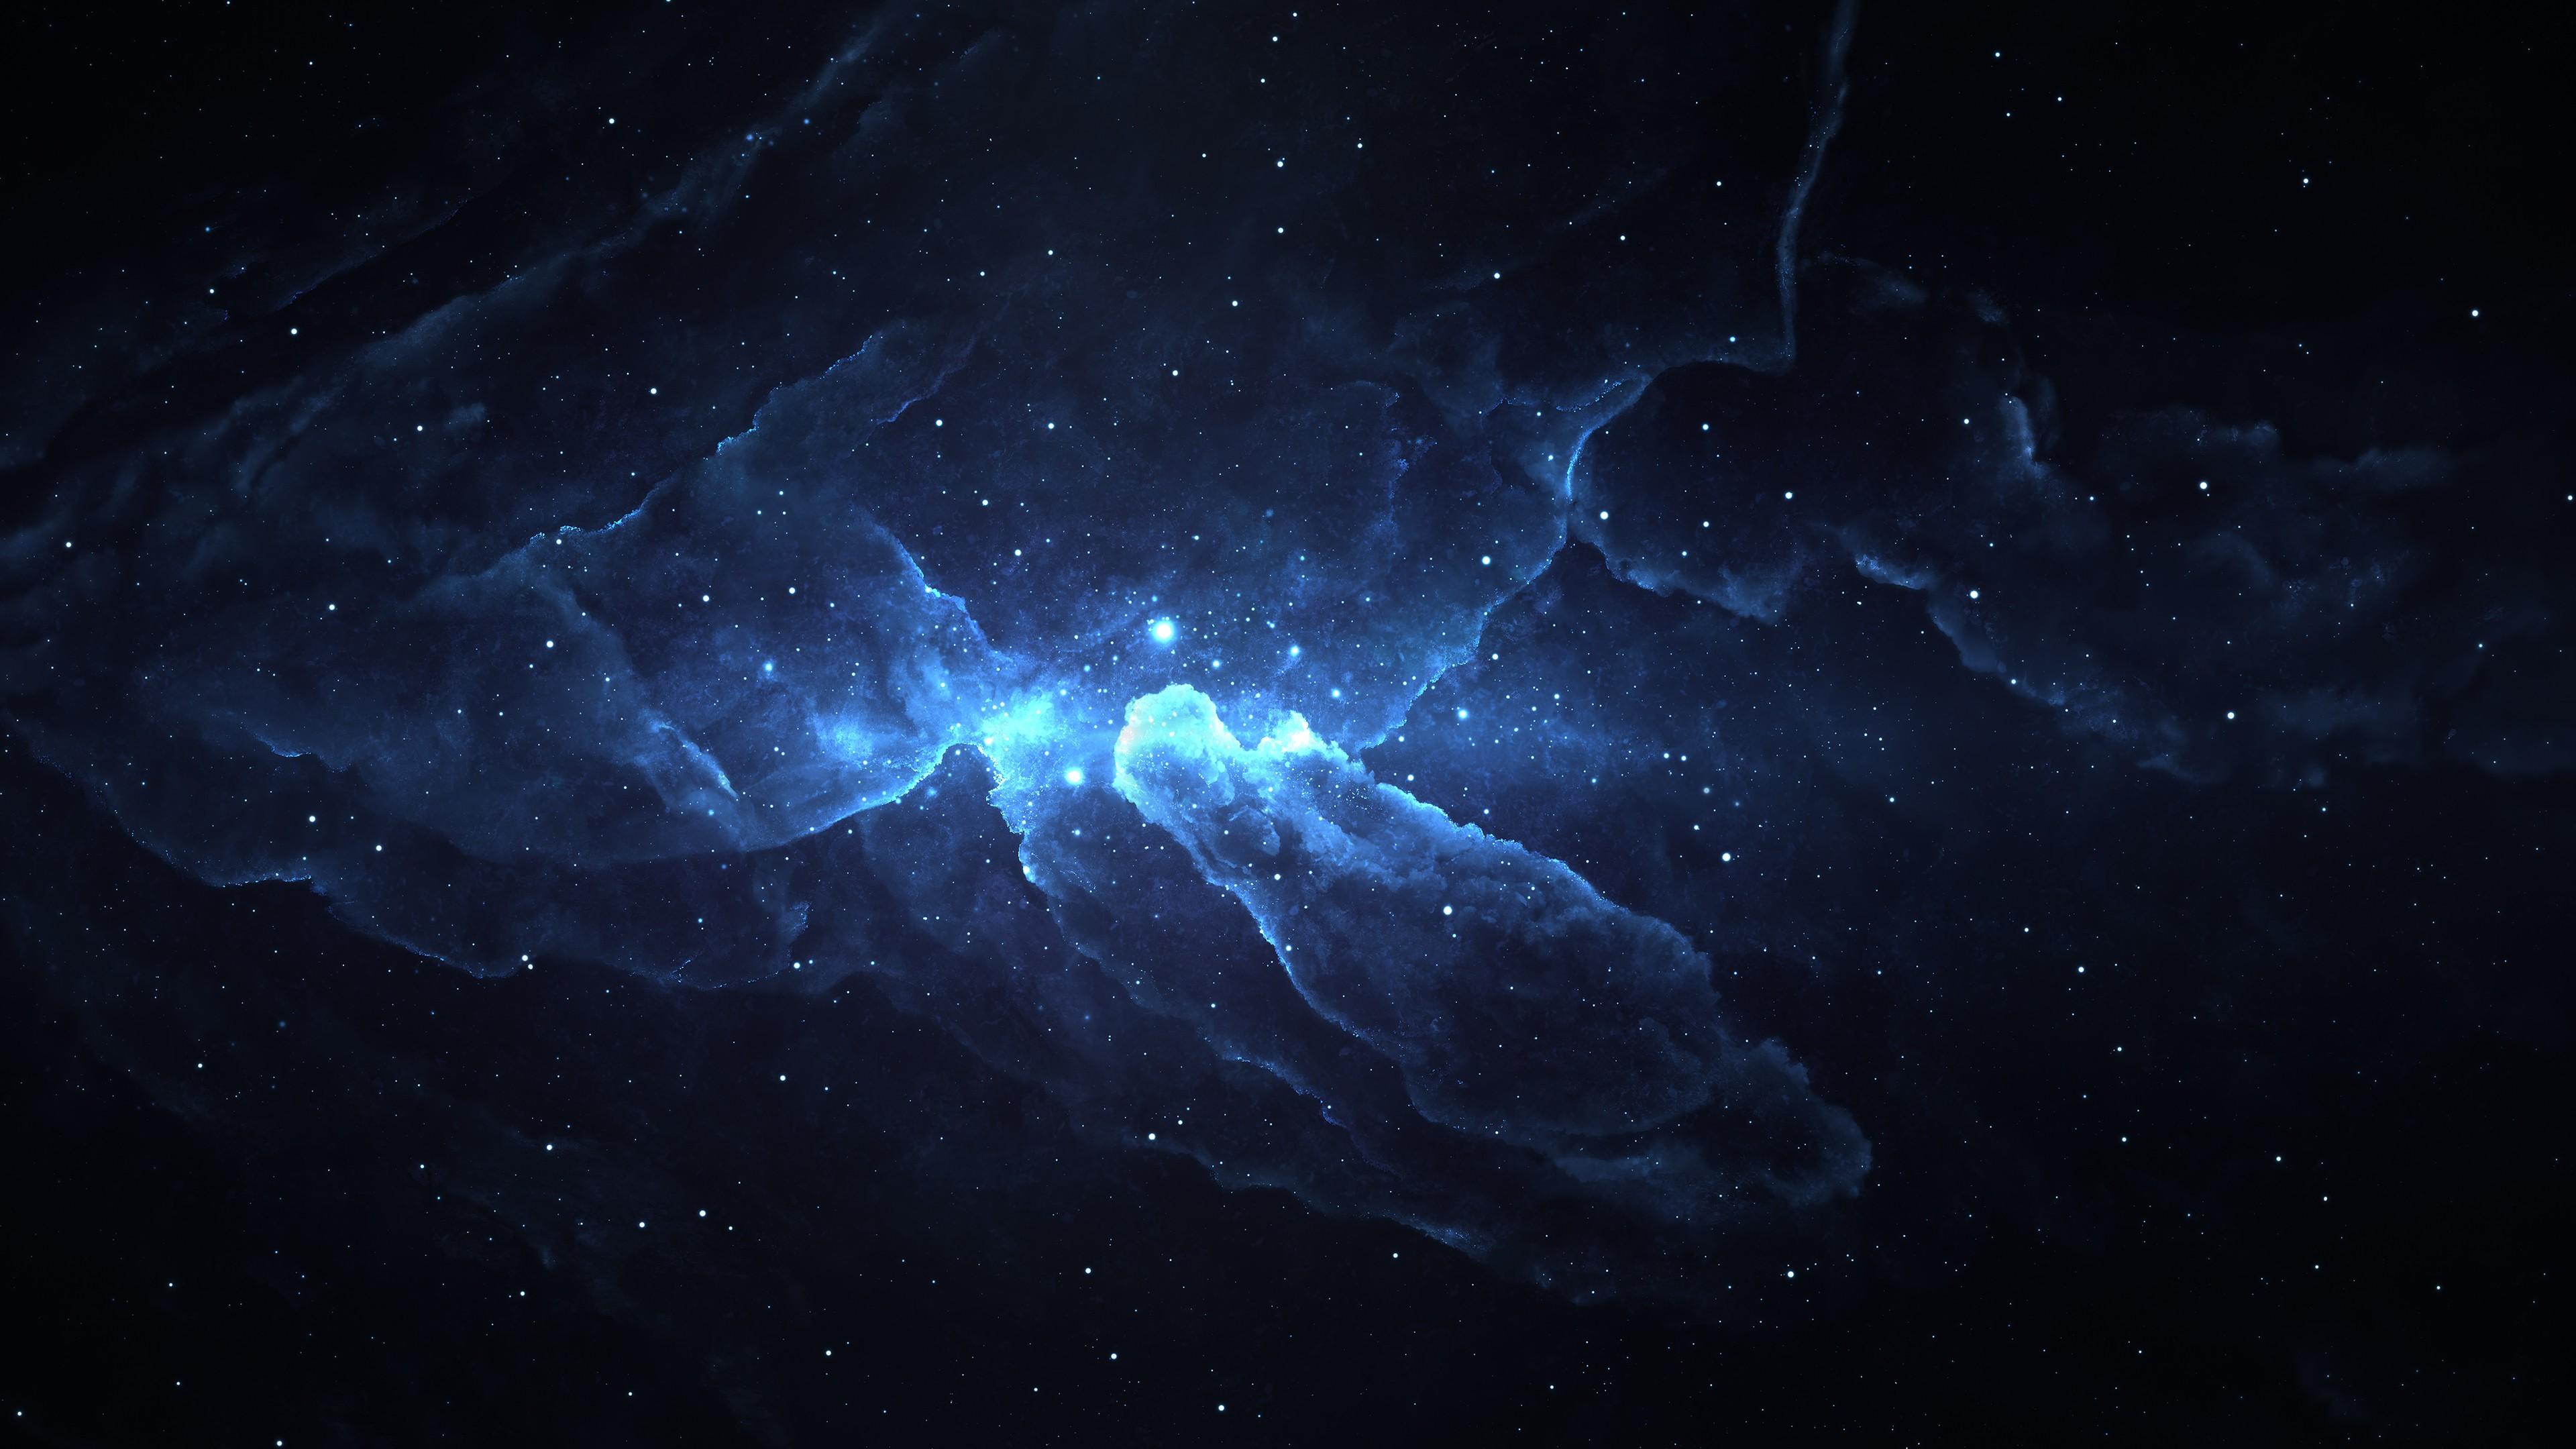 General 3840x2160 digital art artwork nebula space space art stars glowing abstract Starkiteckt lights universe